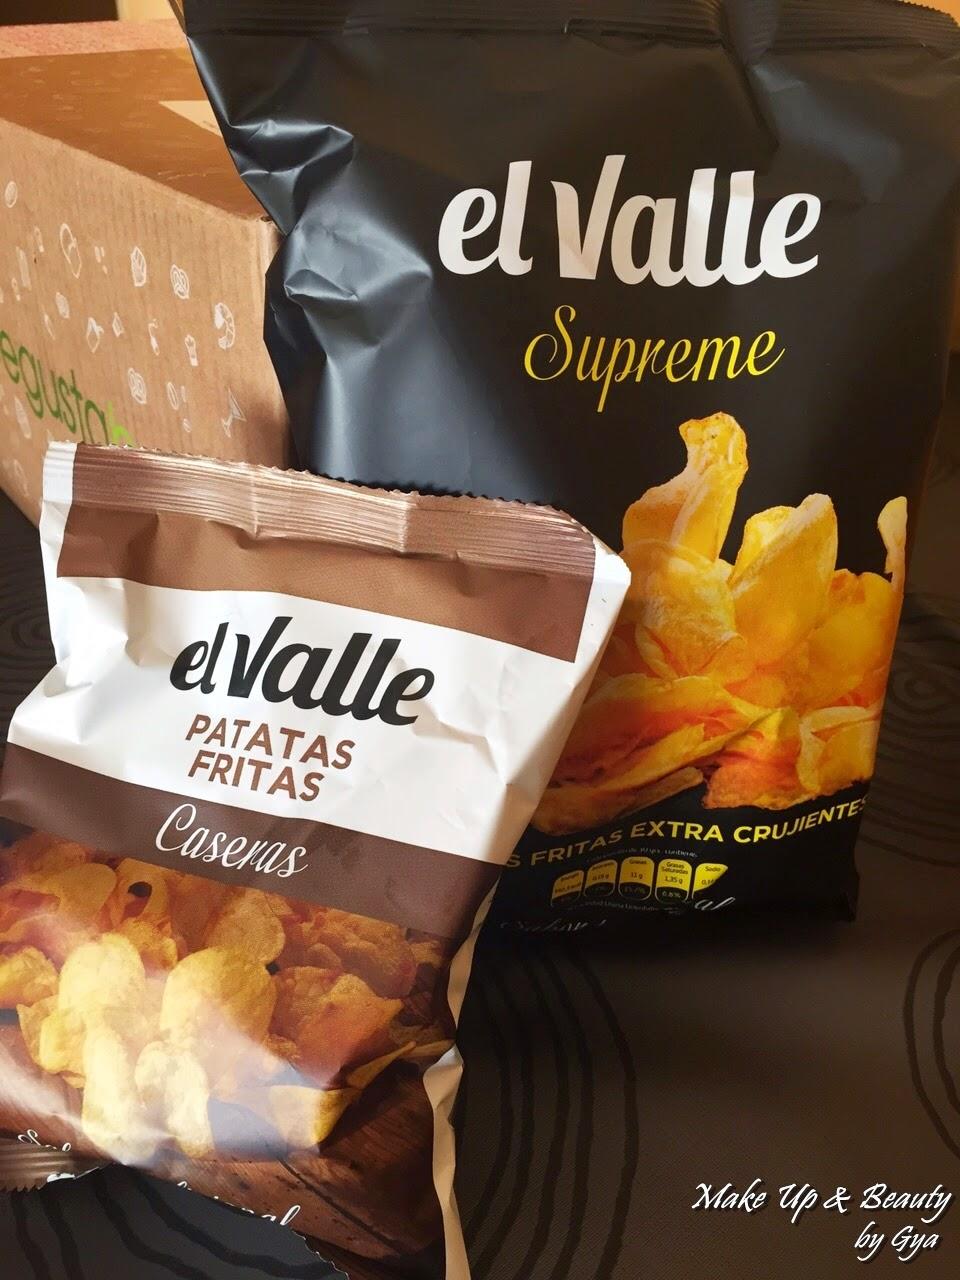 Patatas fritas el valle, degustabox